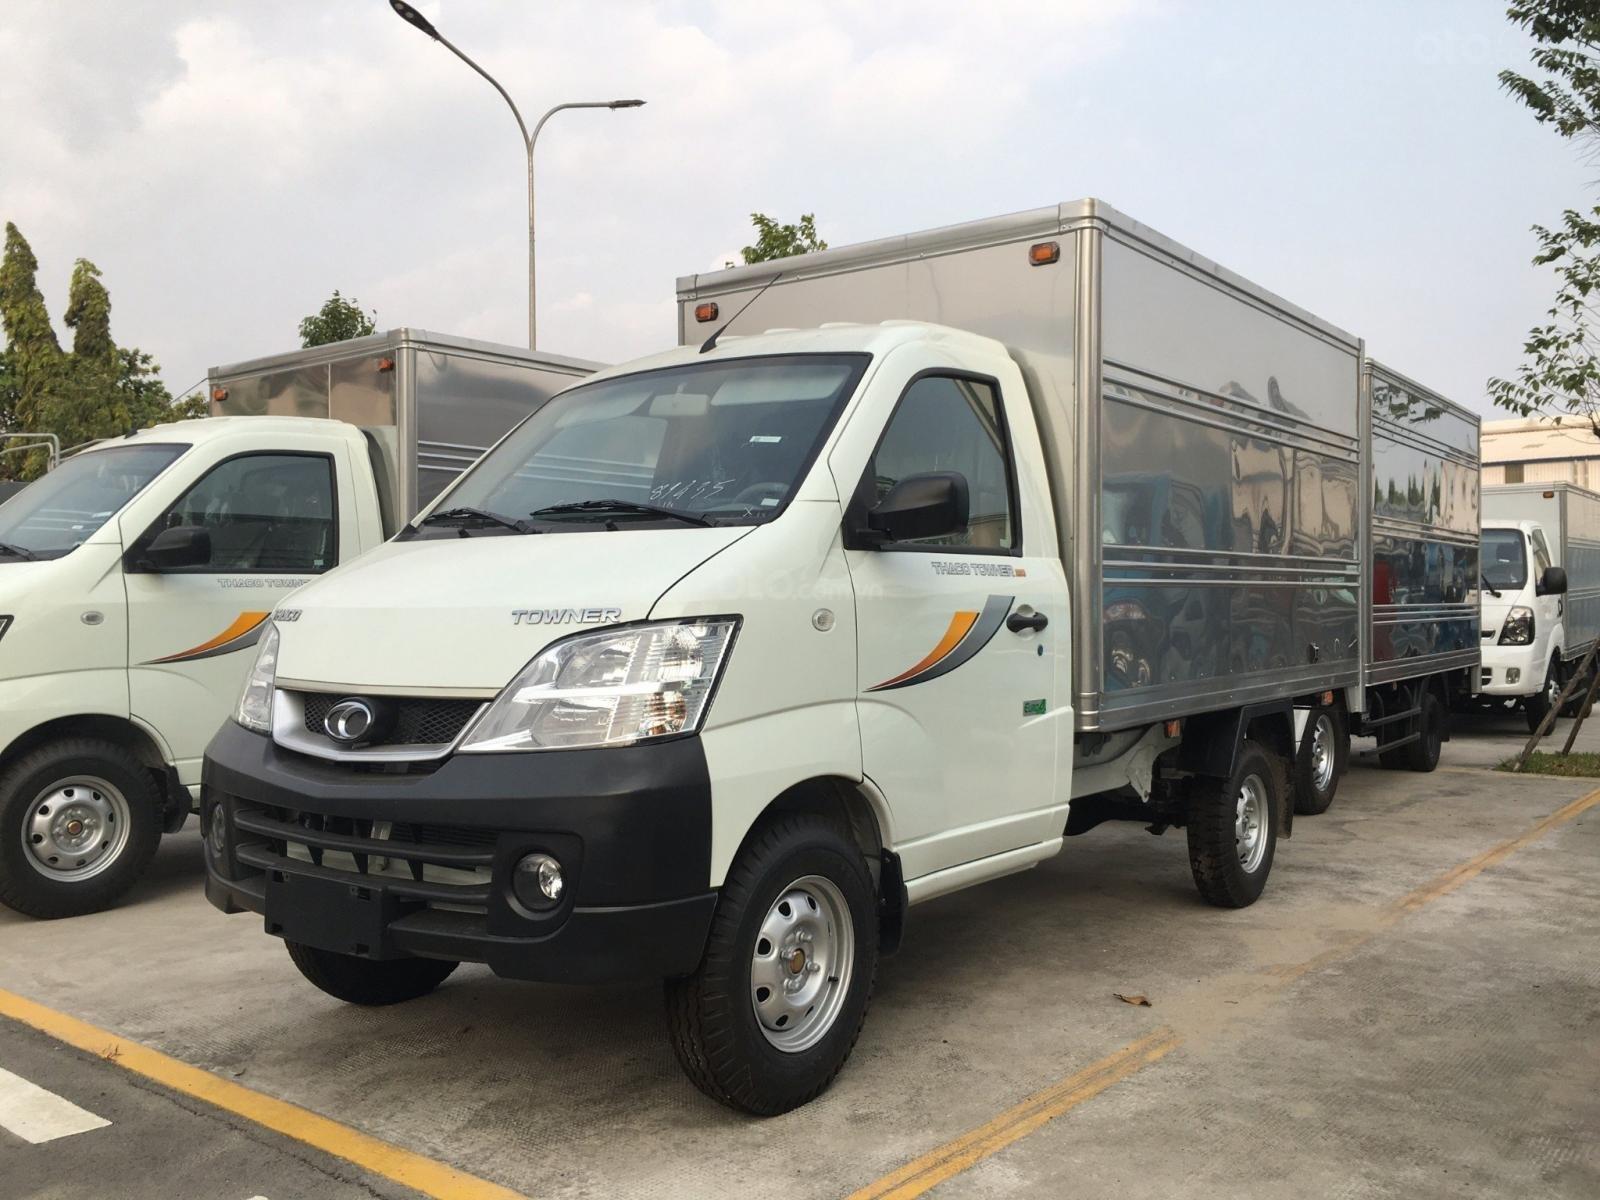 Bán xe tải Thaco Towner 990 đời 2019 (4)